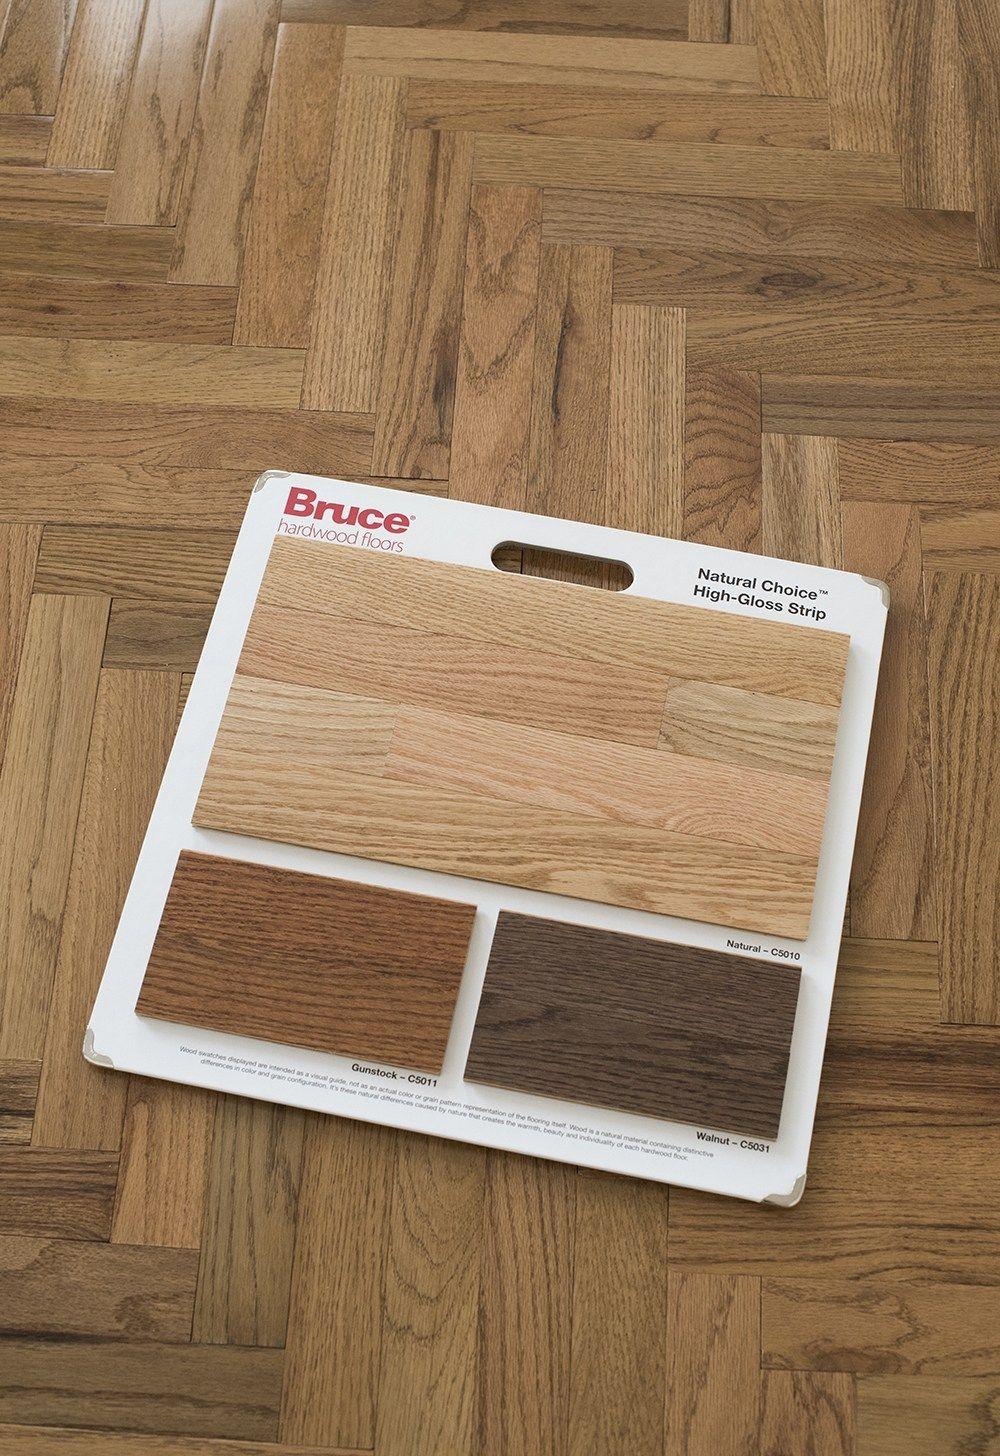 How To Install Herringbone Hardwood Flooring Room For Tuesday Hardwood Floors Solid Hardwood Floors Bruce Hardwood Floors